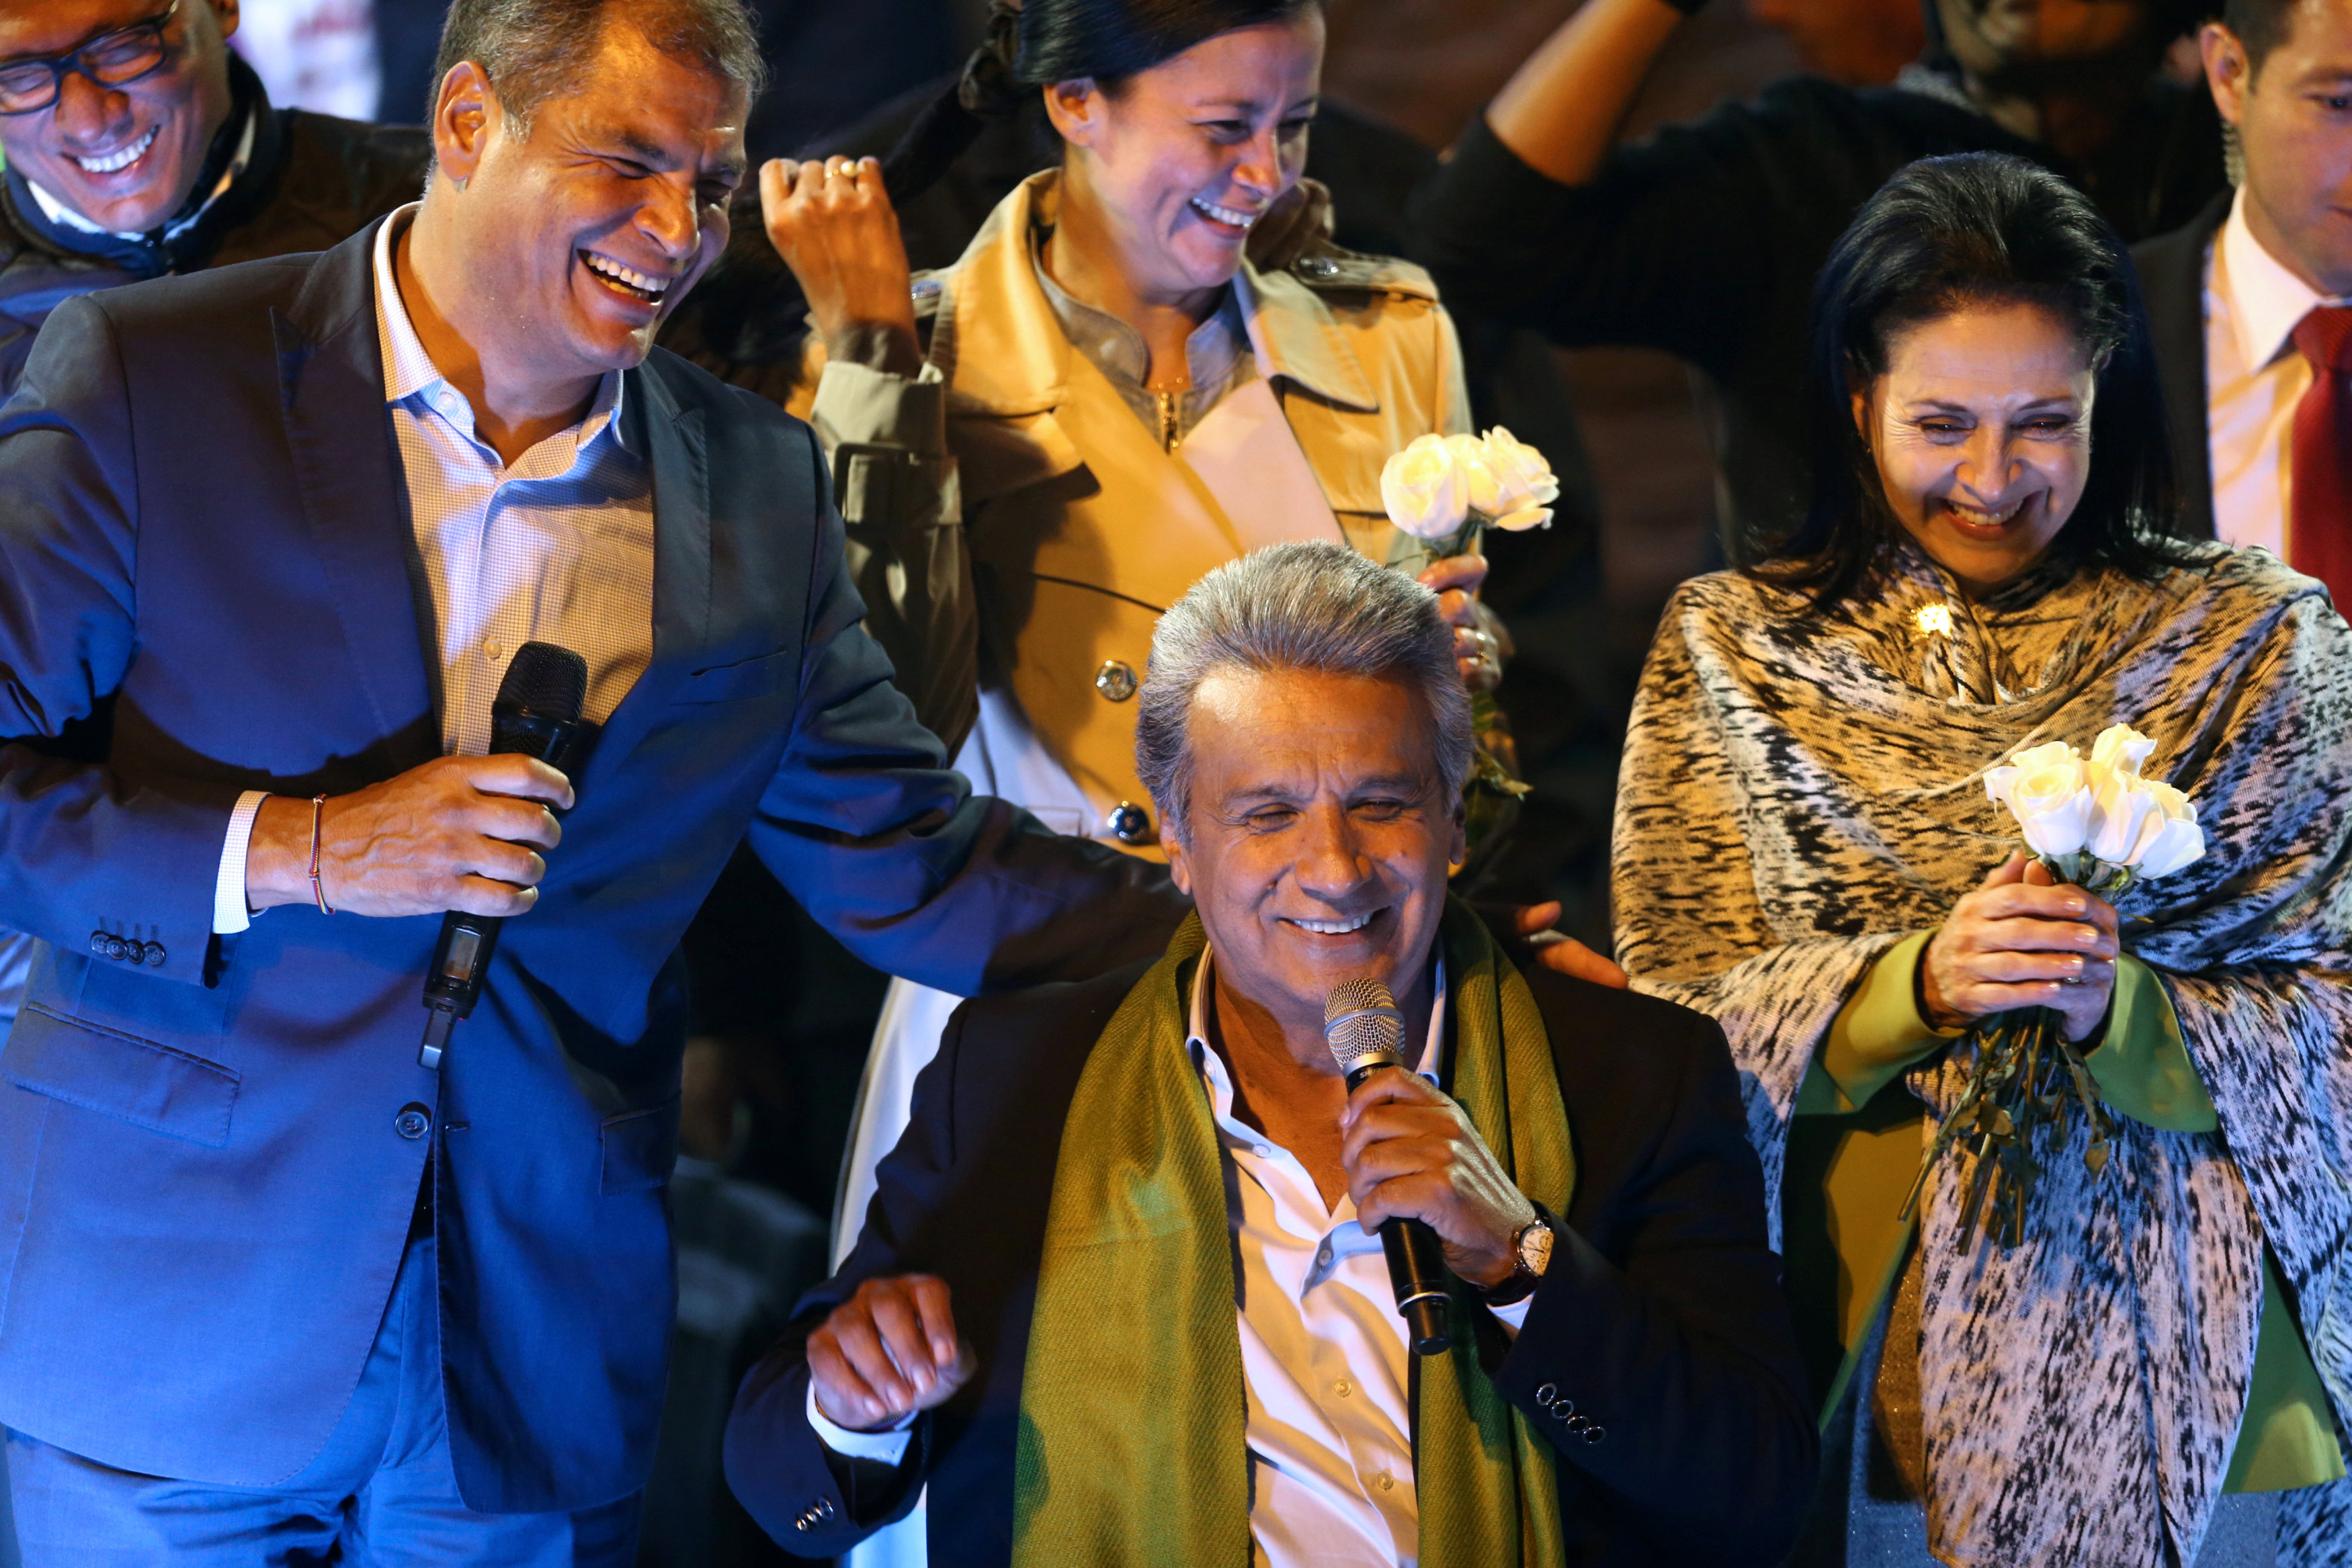 Ecuadorian presidential candidate Lenin Moreno (C) celebrates alongside Ecuadorian President Rafael Correa (L) and his wife Rocio Gonzalez during a national election day in a hotel, in Quito on April 2, 2017. (REUTERS/Mariana Bazo)